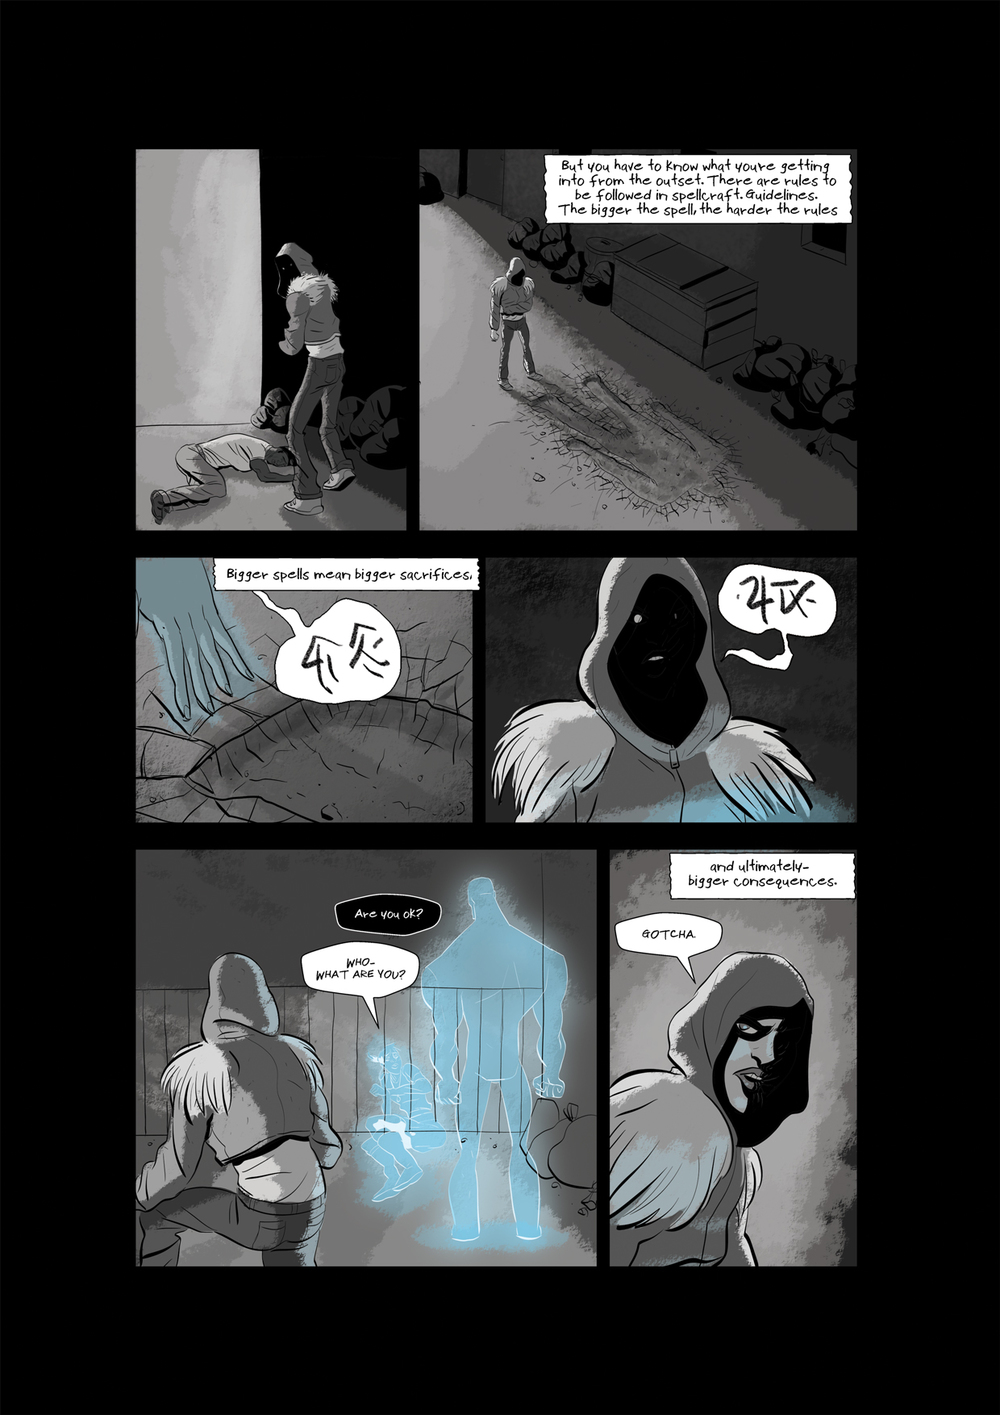 MOJO_page22.jpg